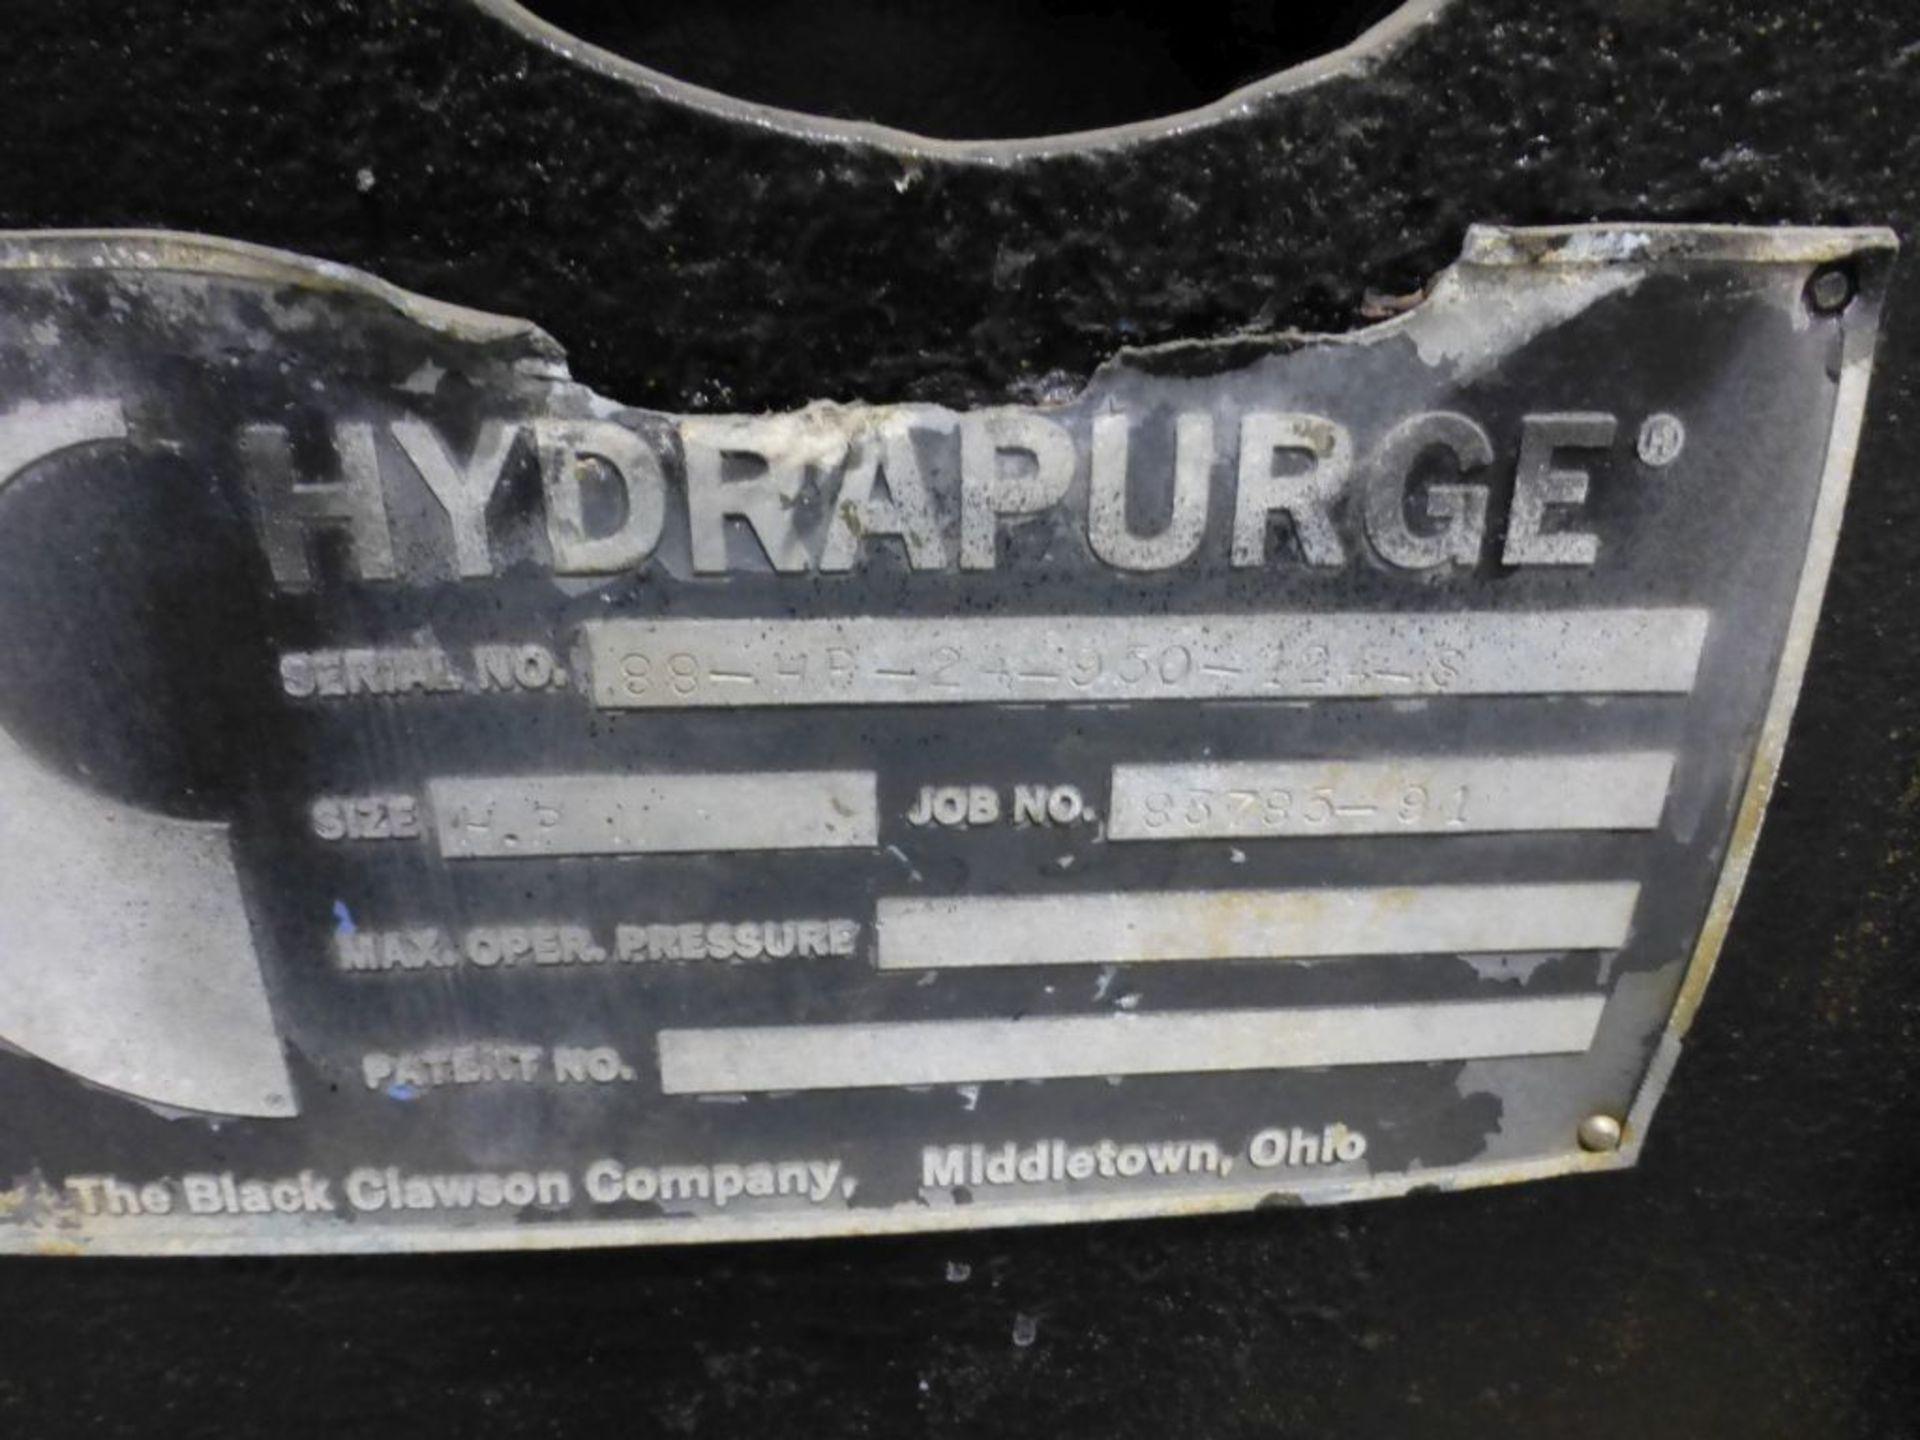 Kadant Black Clawson Size II Hydrapurge | Serial No. 88-HP-24-950-124-S; Size: HP 11 - Image 8 of 8